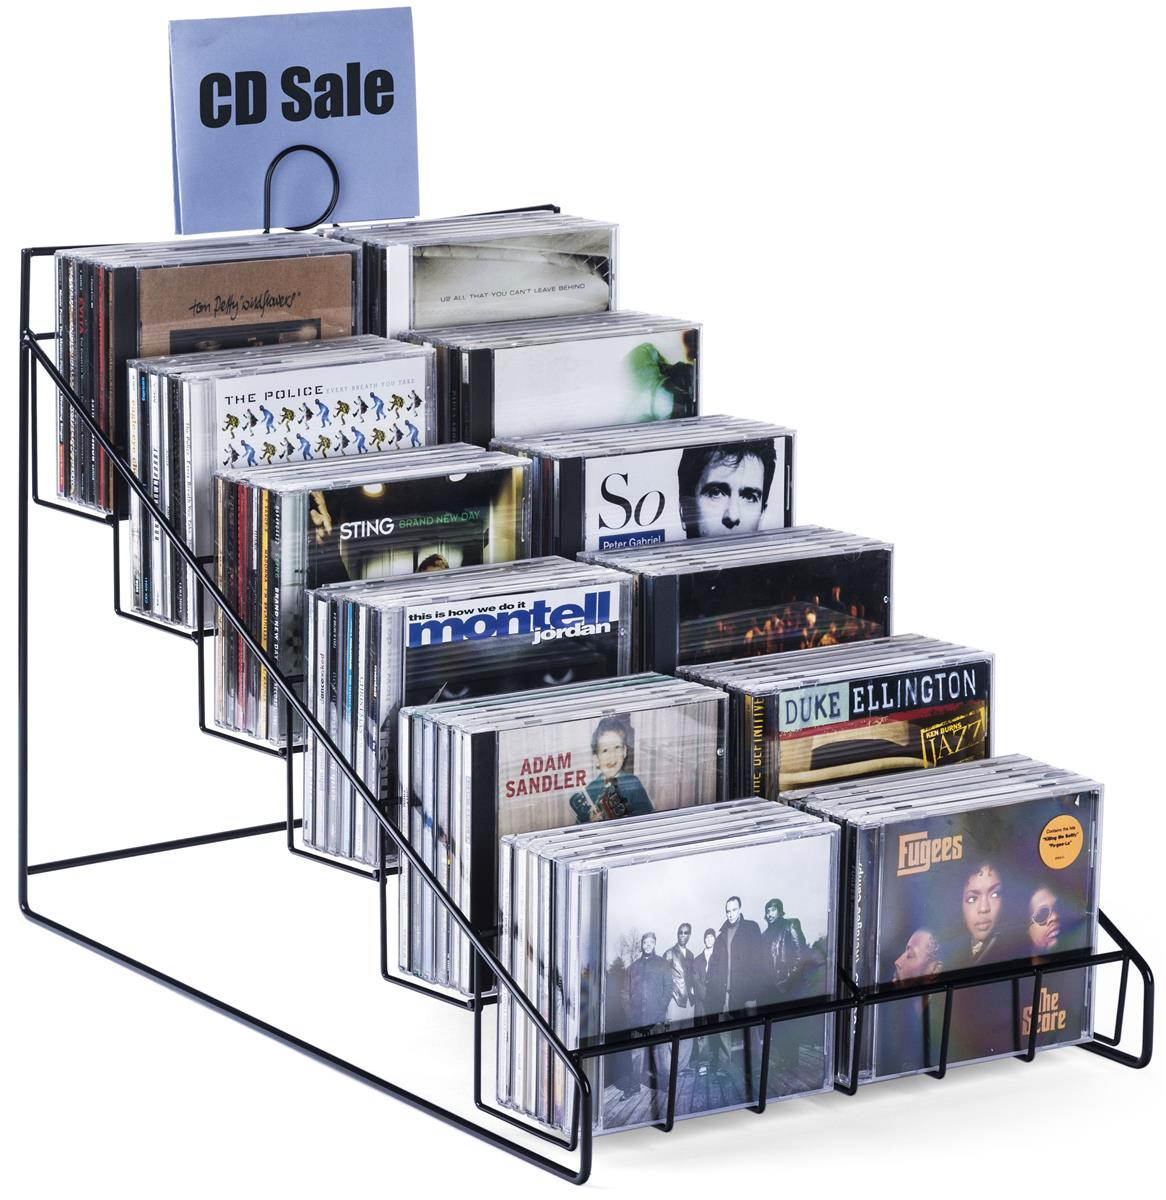 Countertop Dvd Display 6 Tiers 12 Pockets